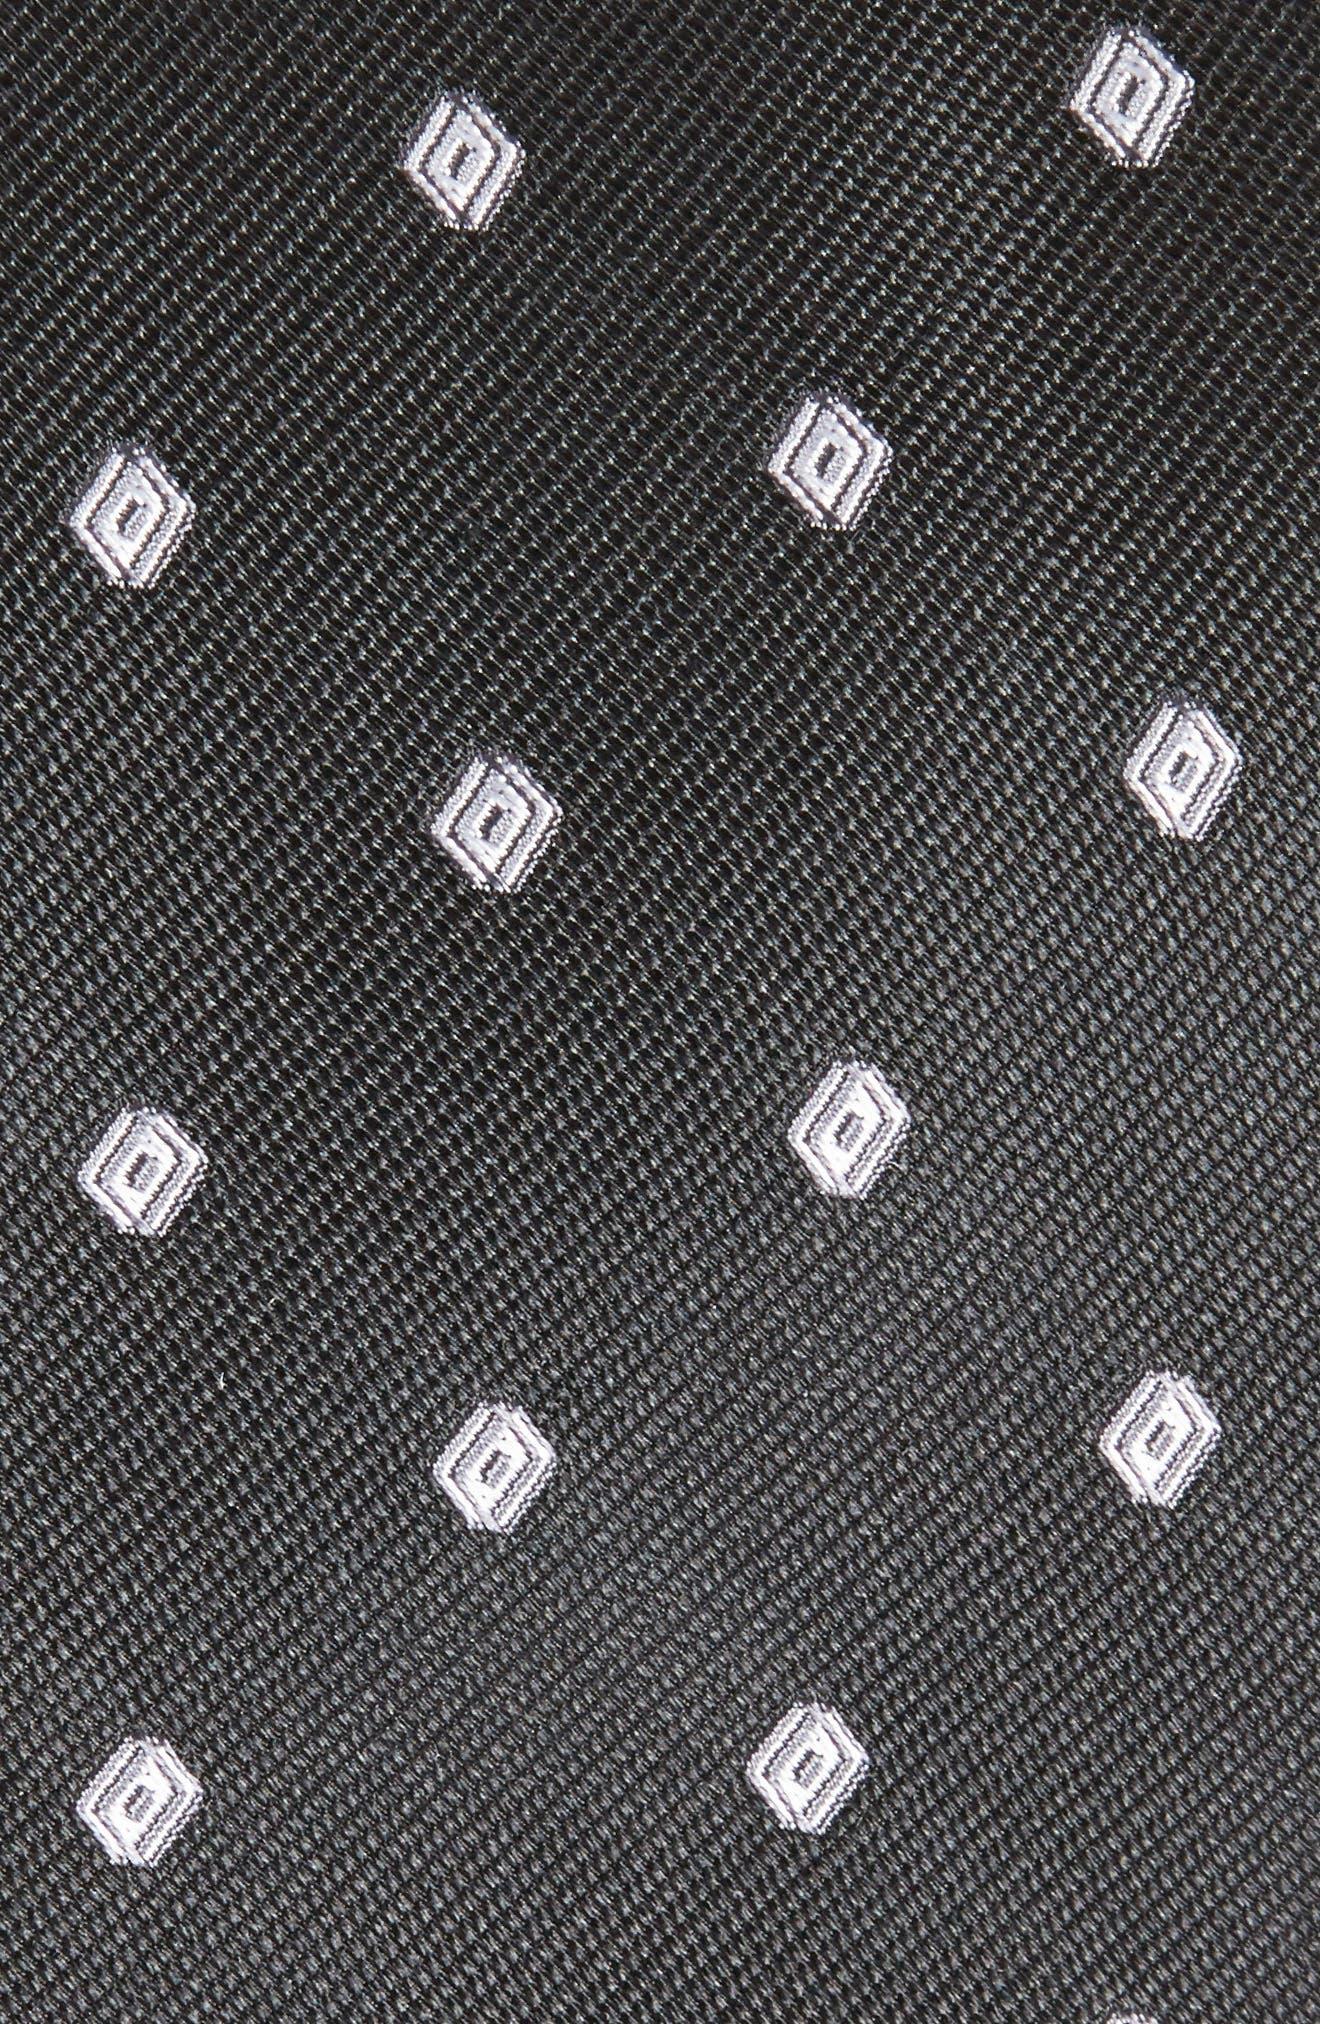 Kaleri Neat Diamond Grid Silk Tie,                             Alternate thumbnail 2, color,                             001